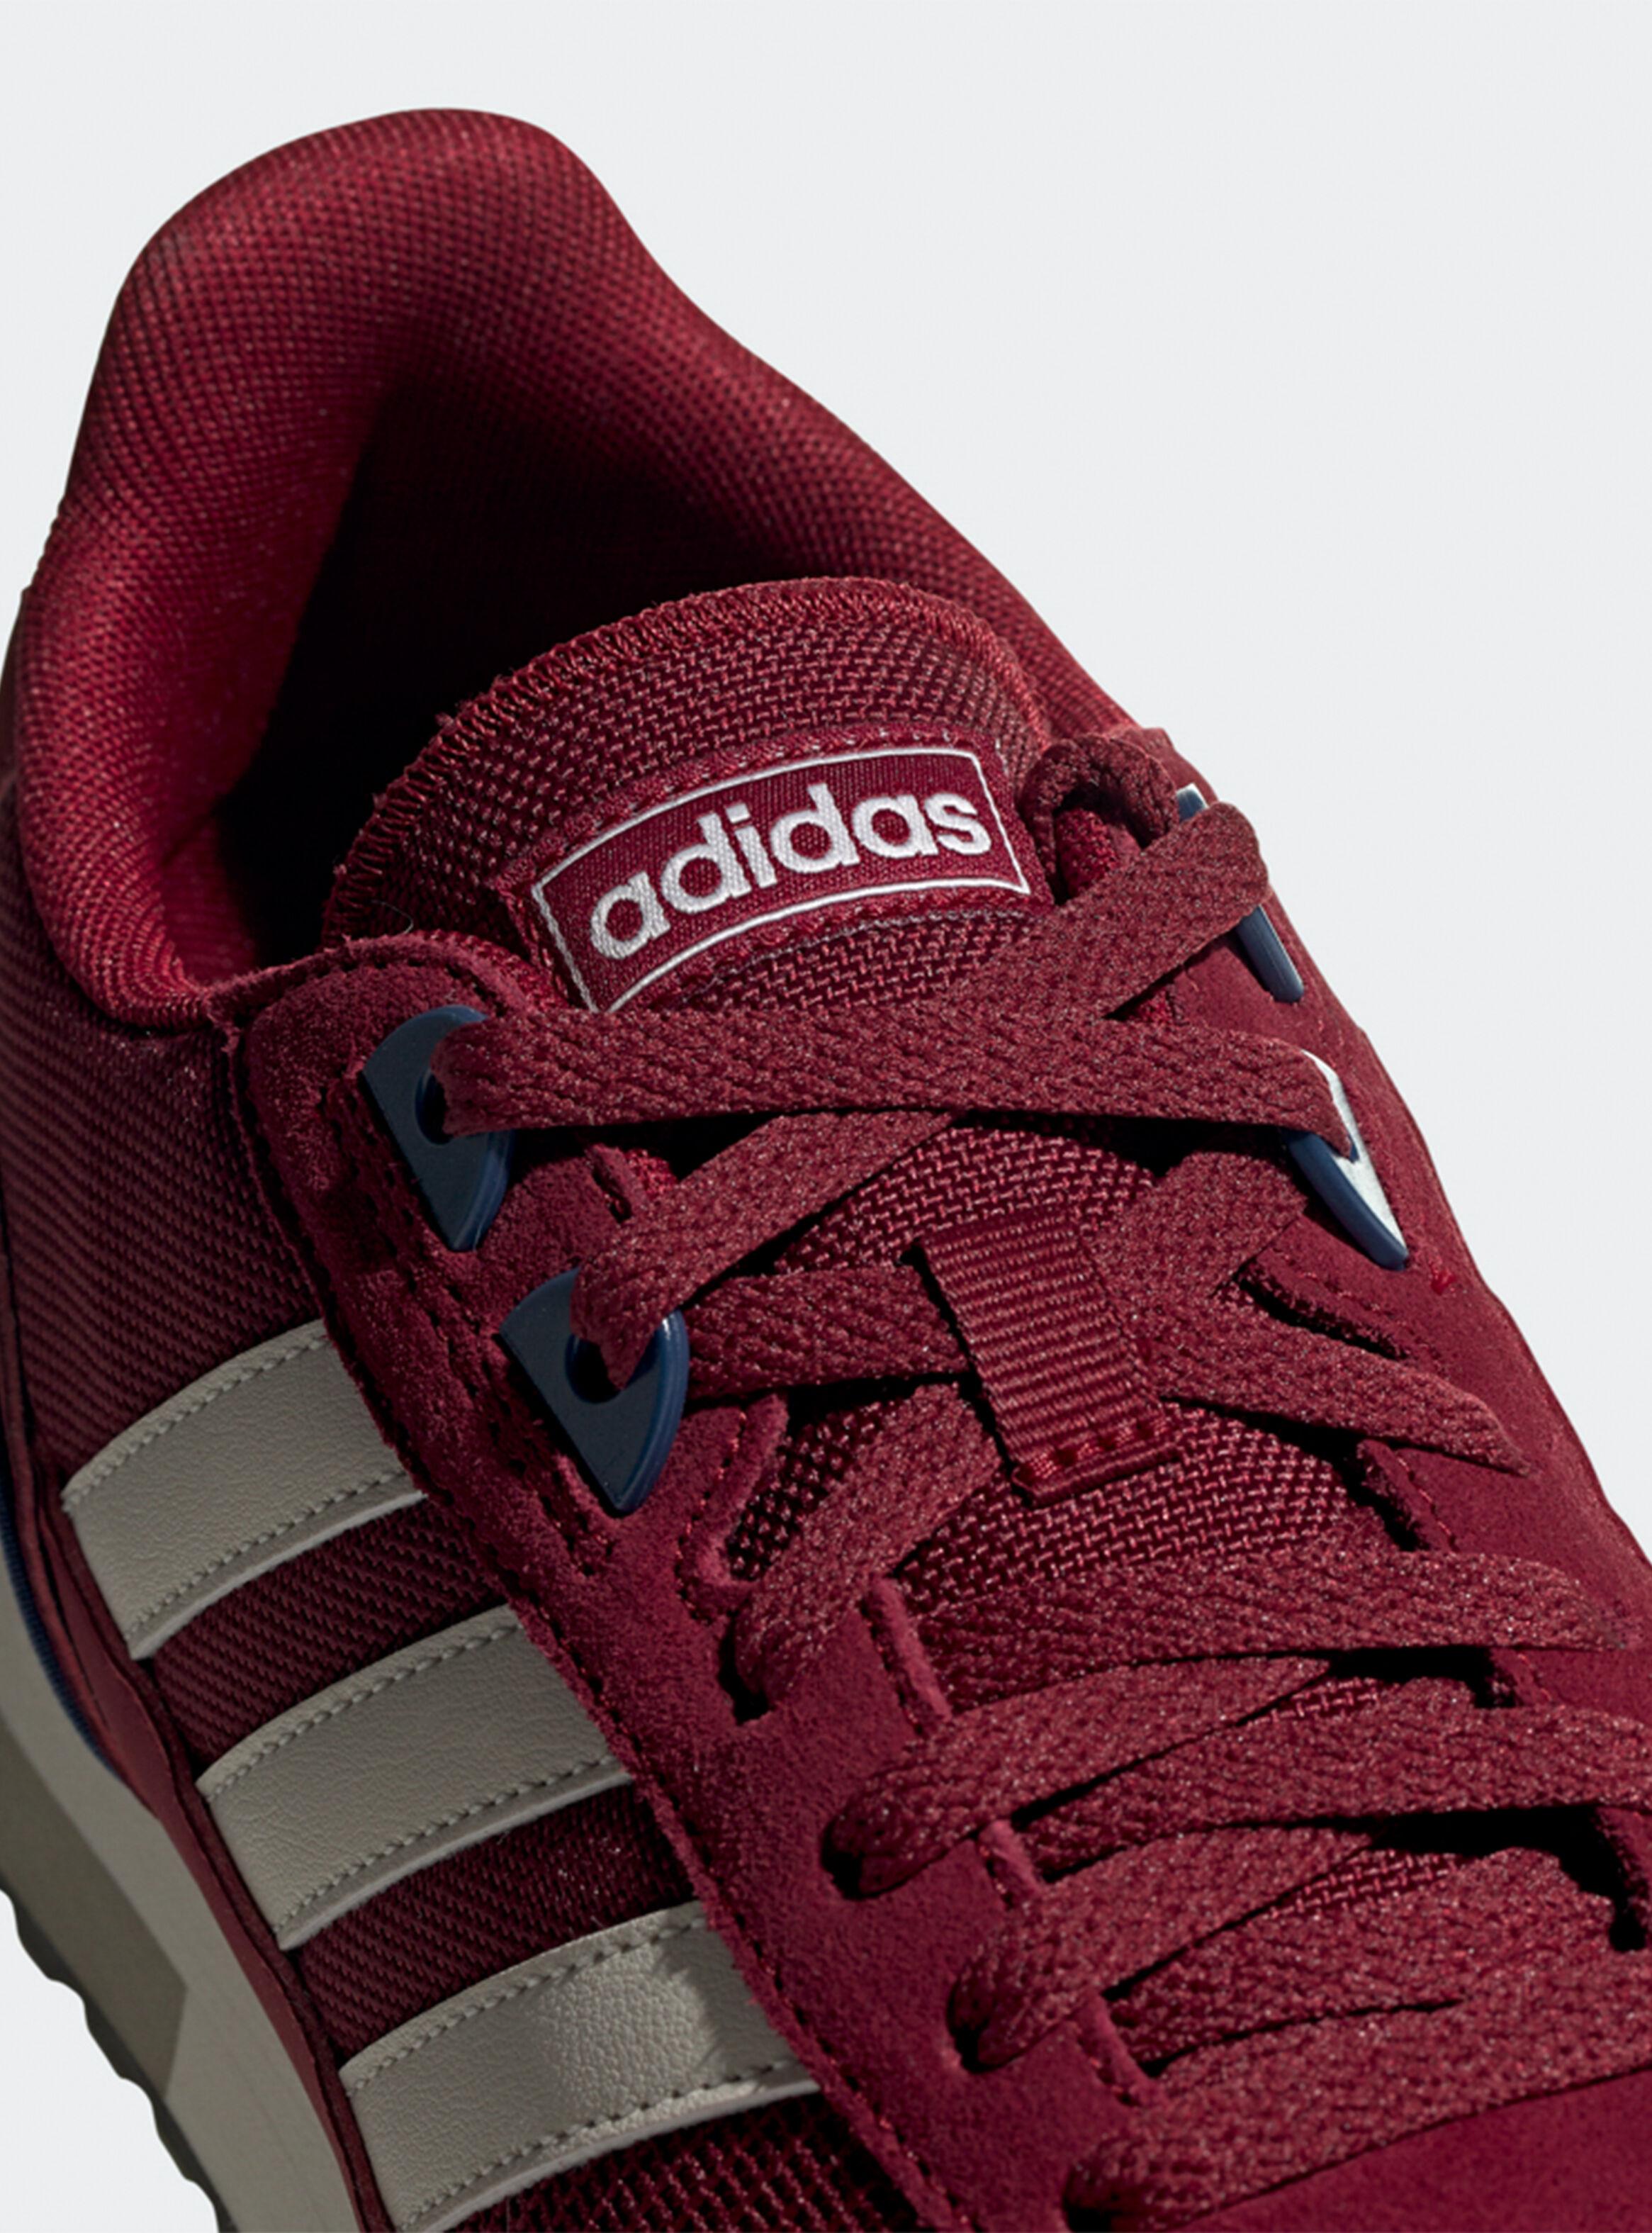 Zapatilla Adidas Urbana 8K 2020 Hombre